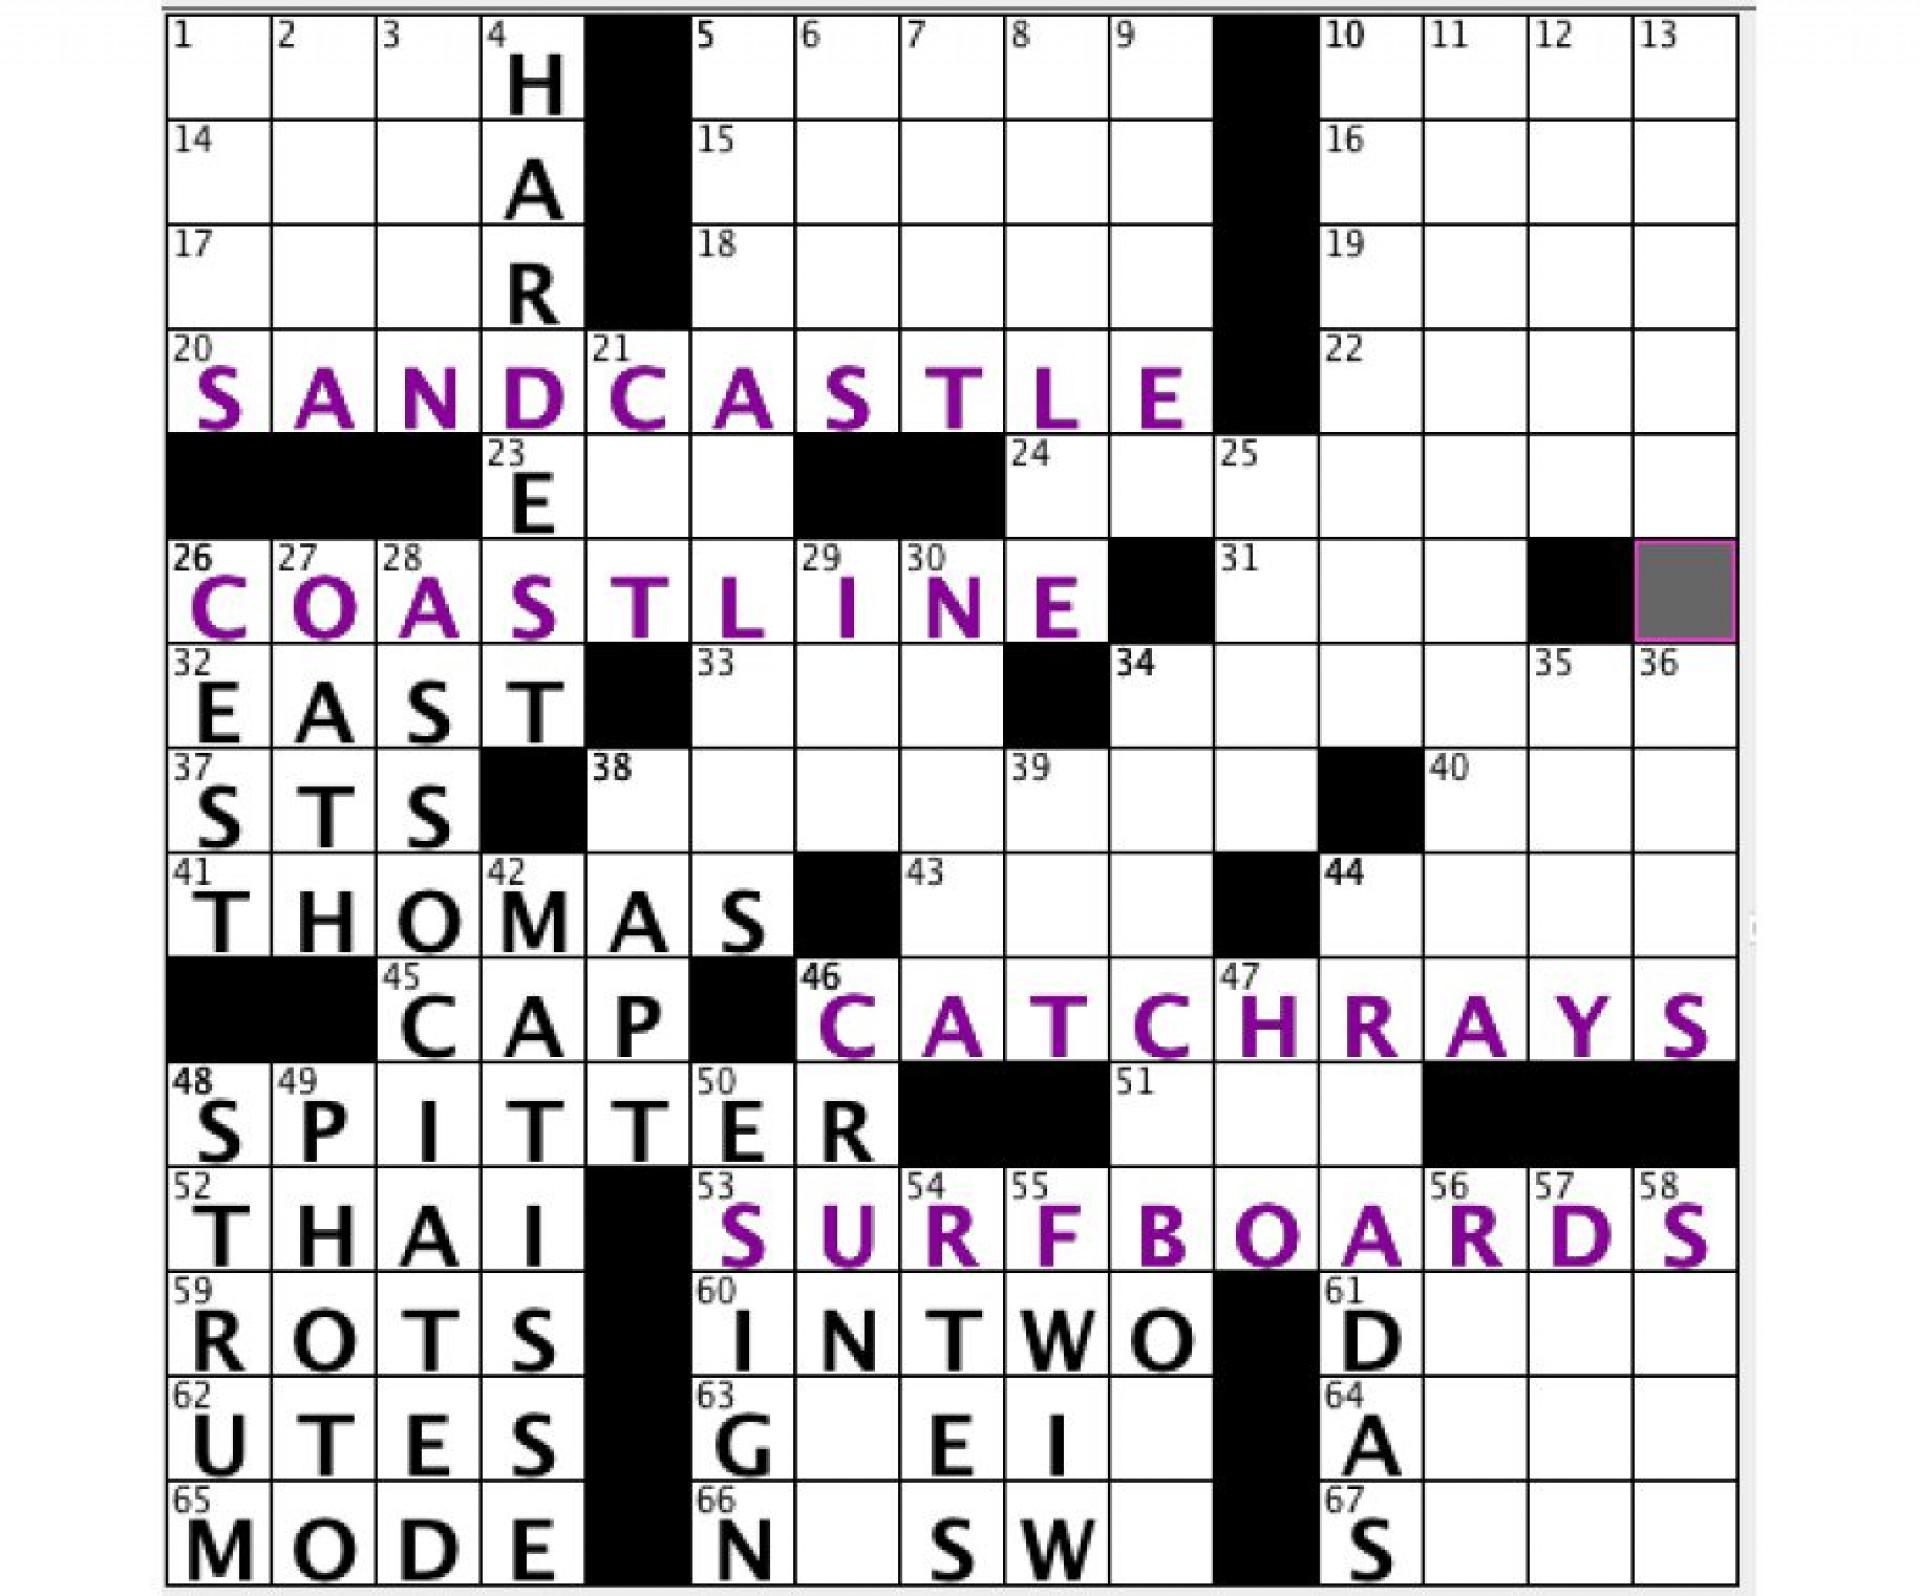 000 Unforgettable Robust Crossword Clue Sample  Strong 4 Letter Vigorou 7 81920